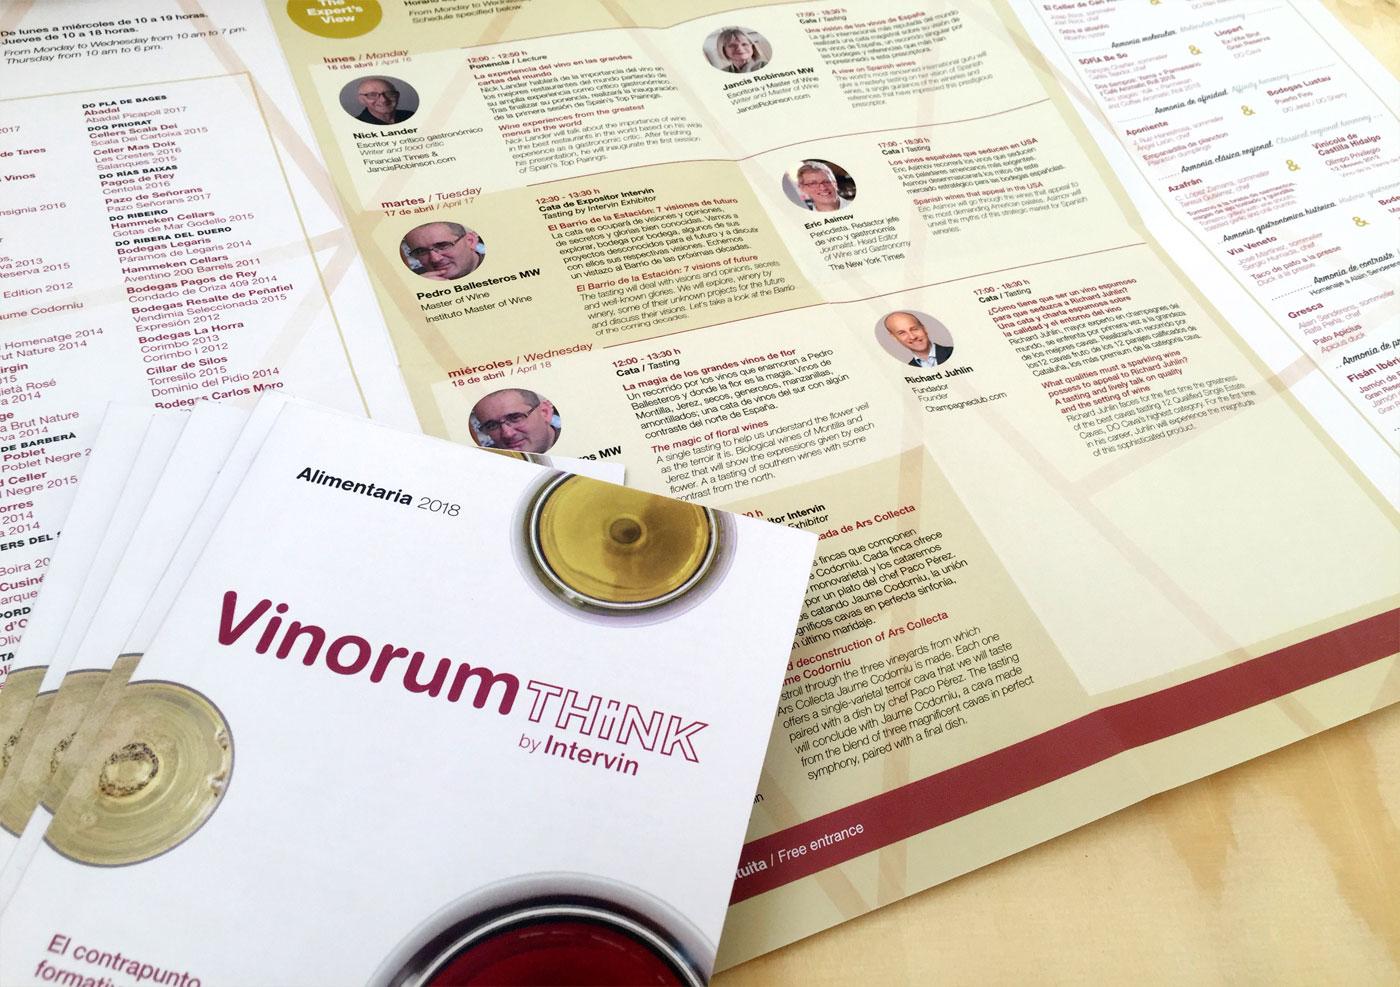 vinorum intervin alimentaria